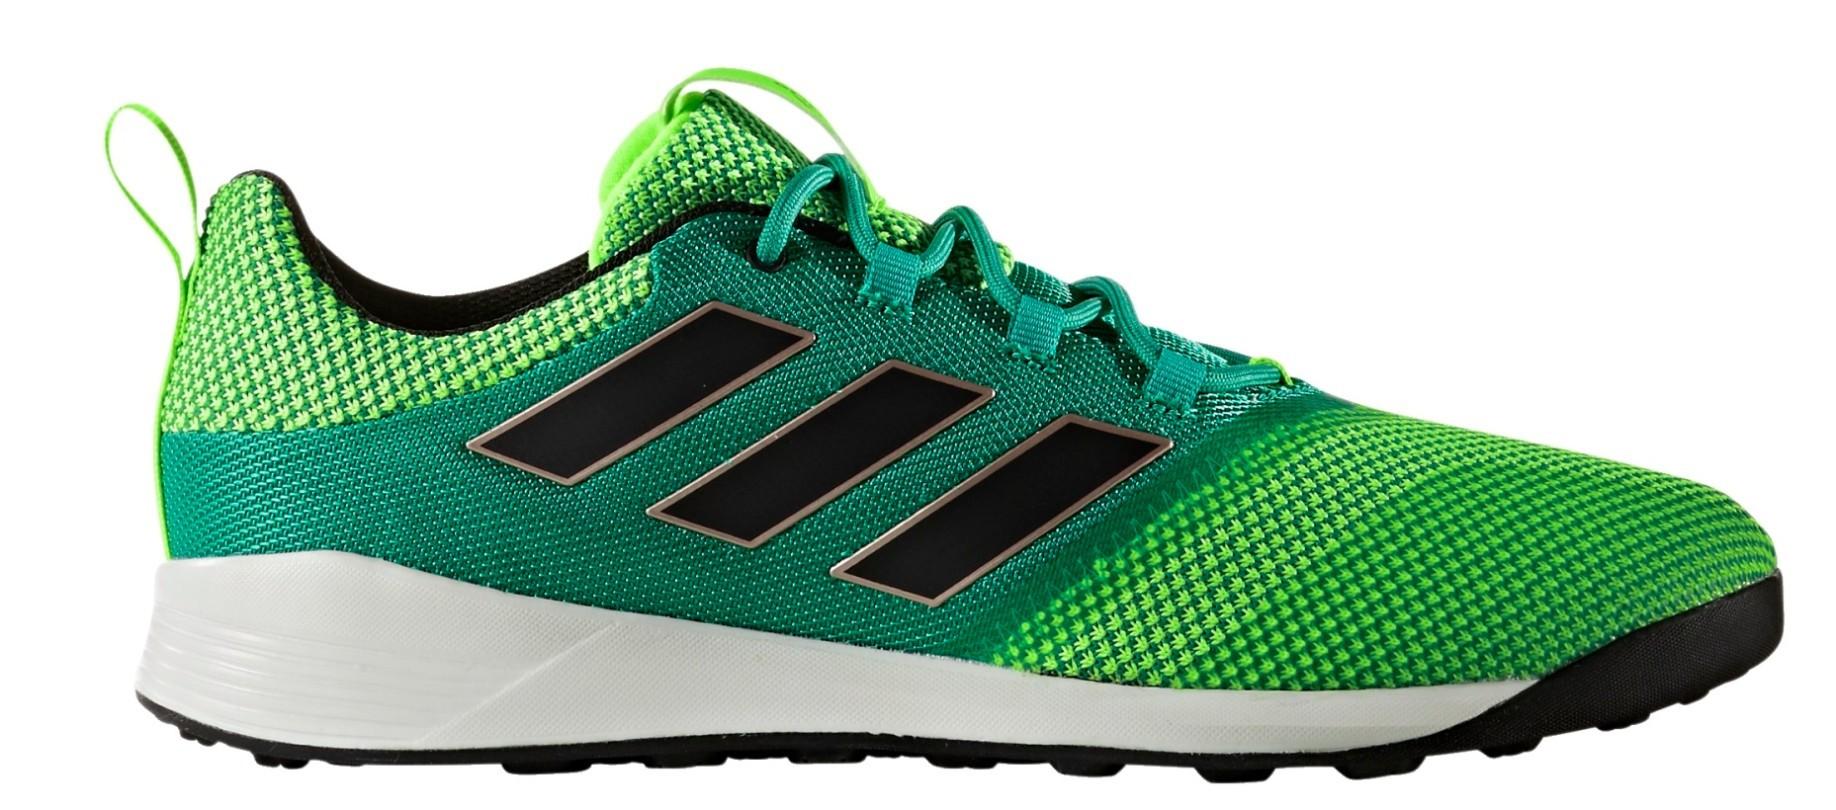 Shoes Soccer Adidas Ace Tango 17.2 TR colore Green - Adidas - SportIT.com 21171d1ec9